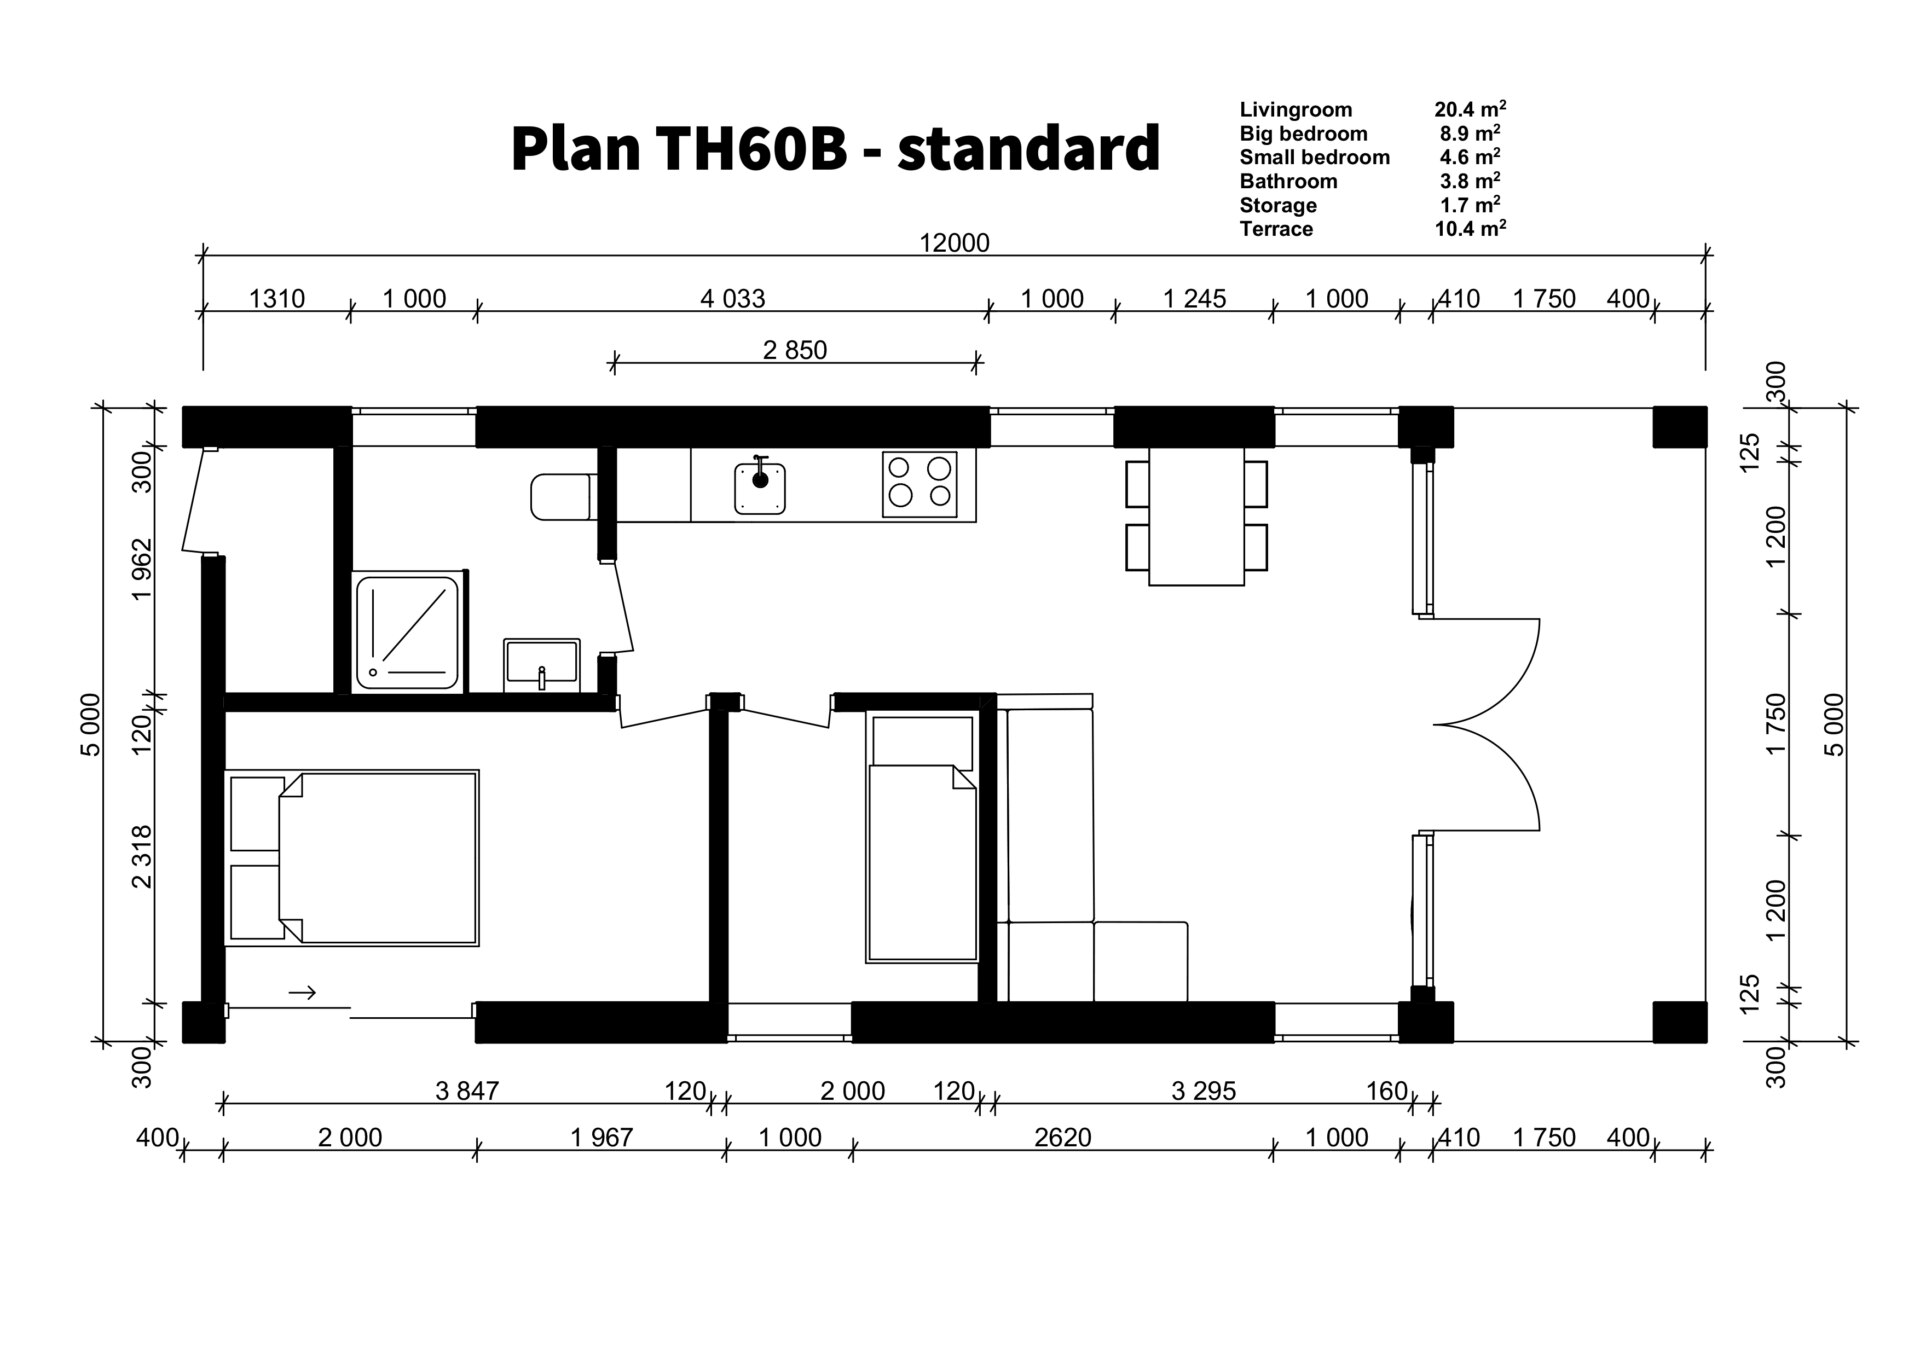 TH60B - standard plan